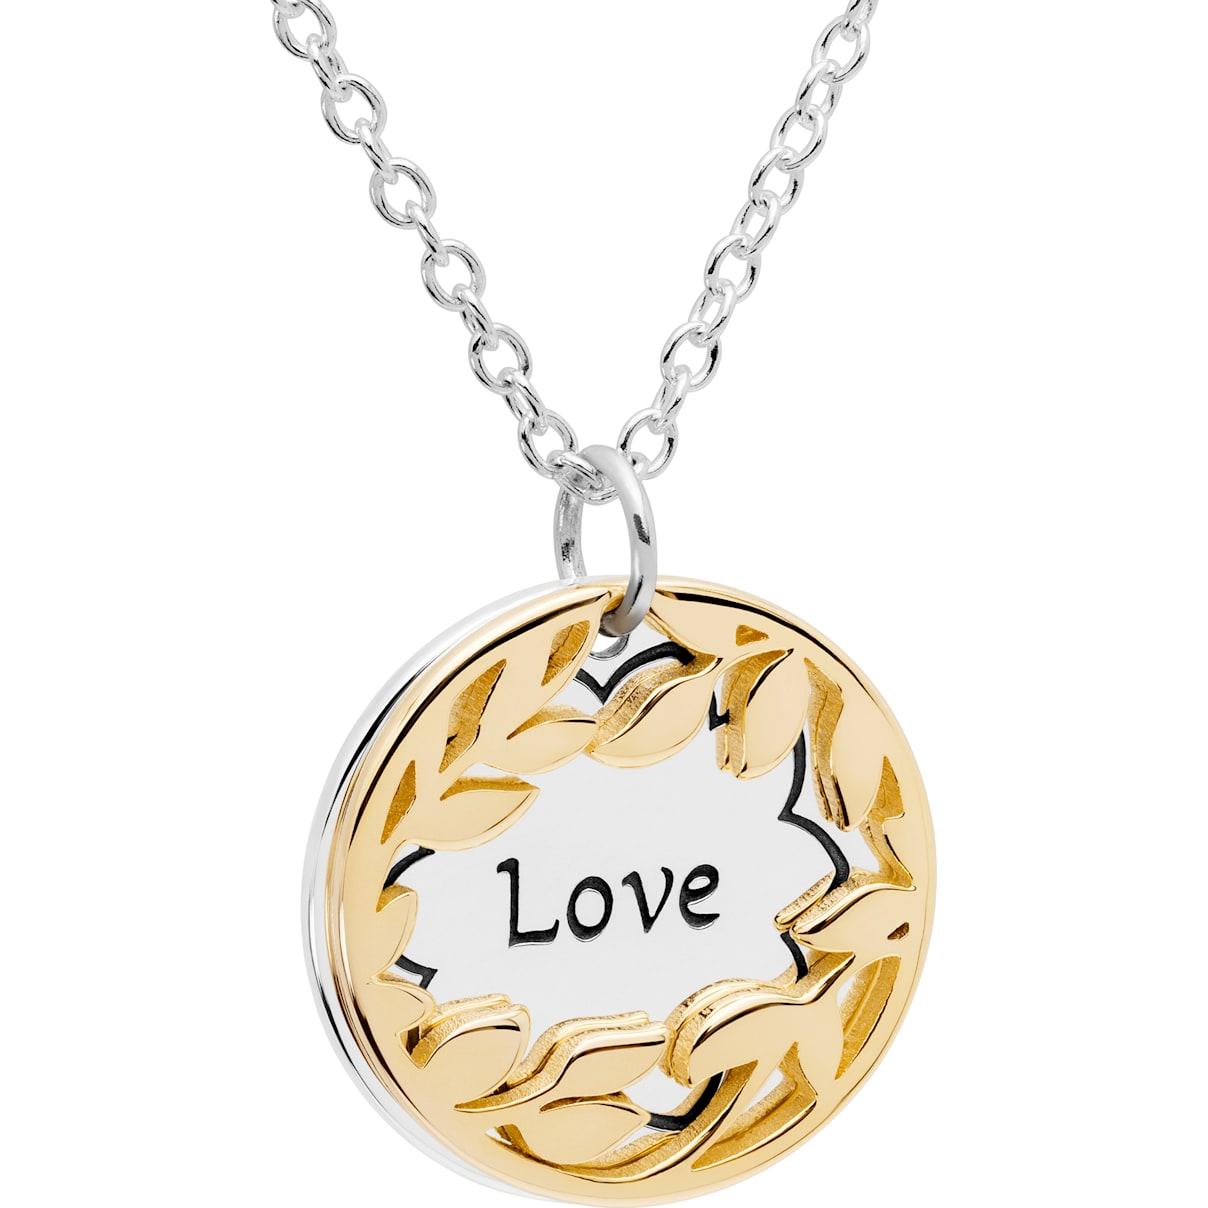 Swarovski Treasure Necklace - Love